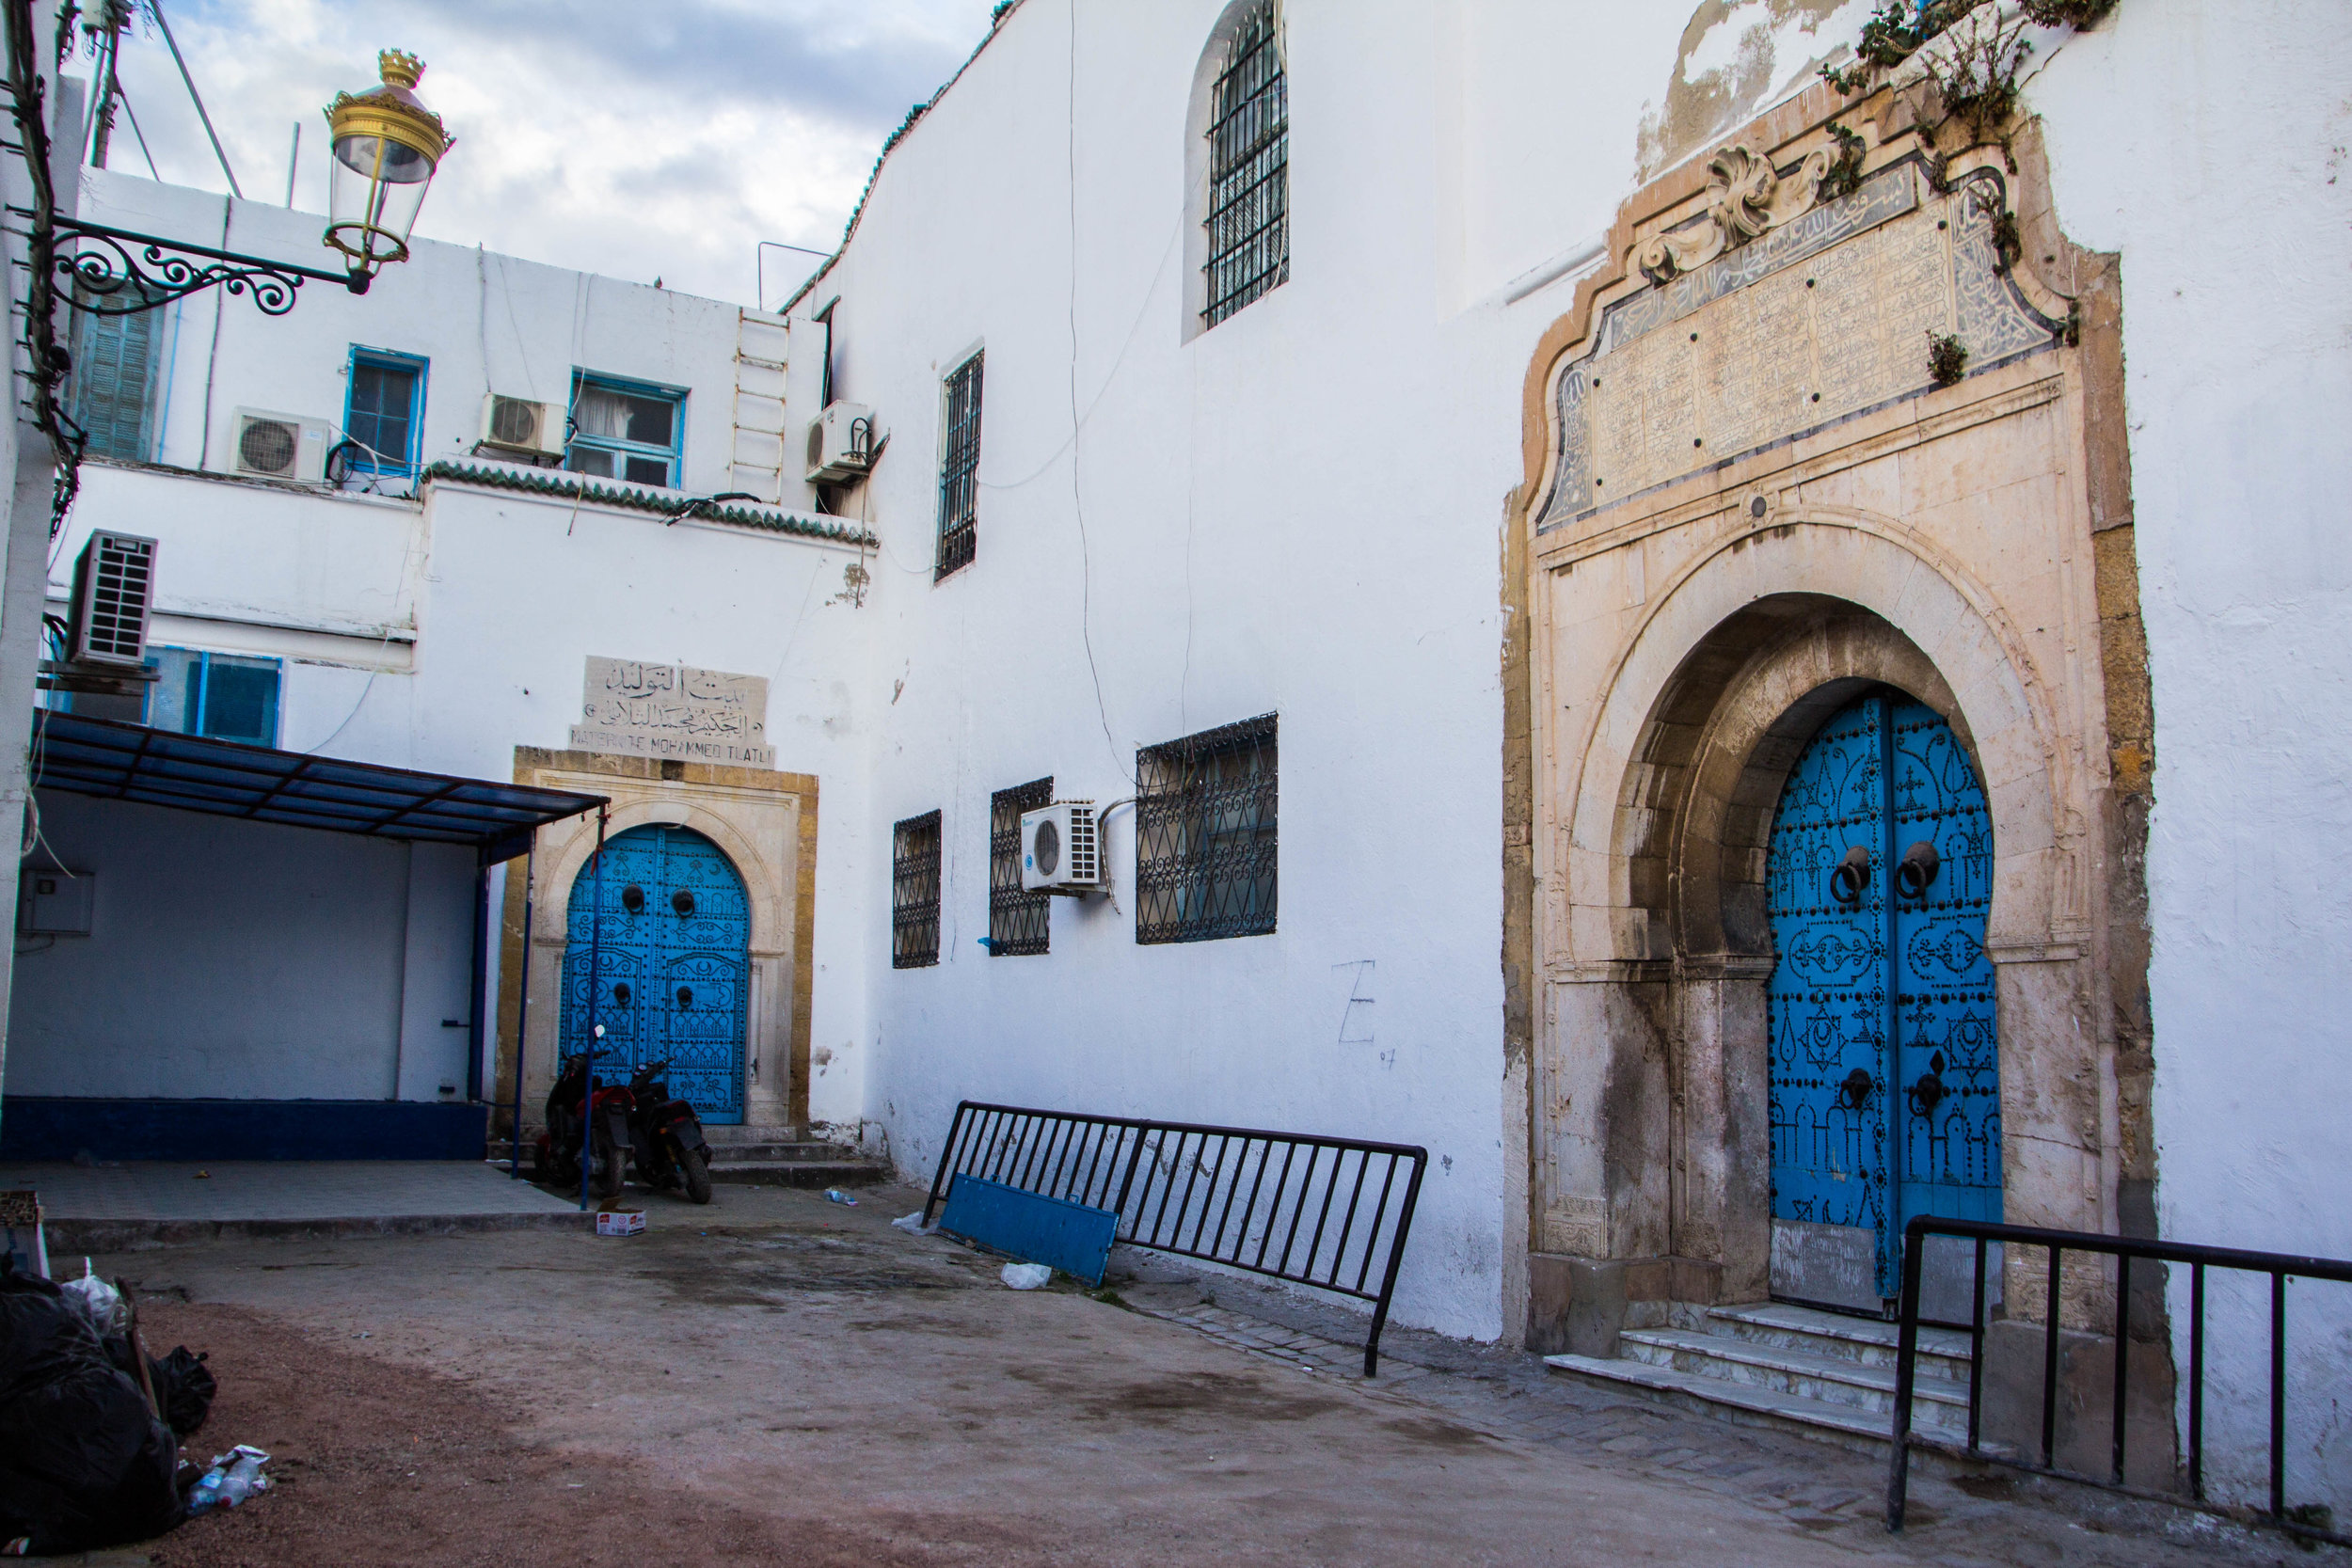 medina-photography-tunis-tunisia-33.jpg